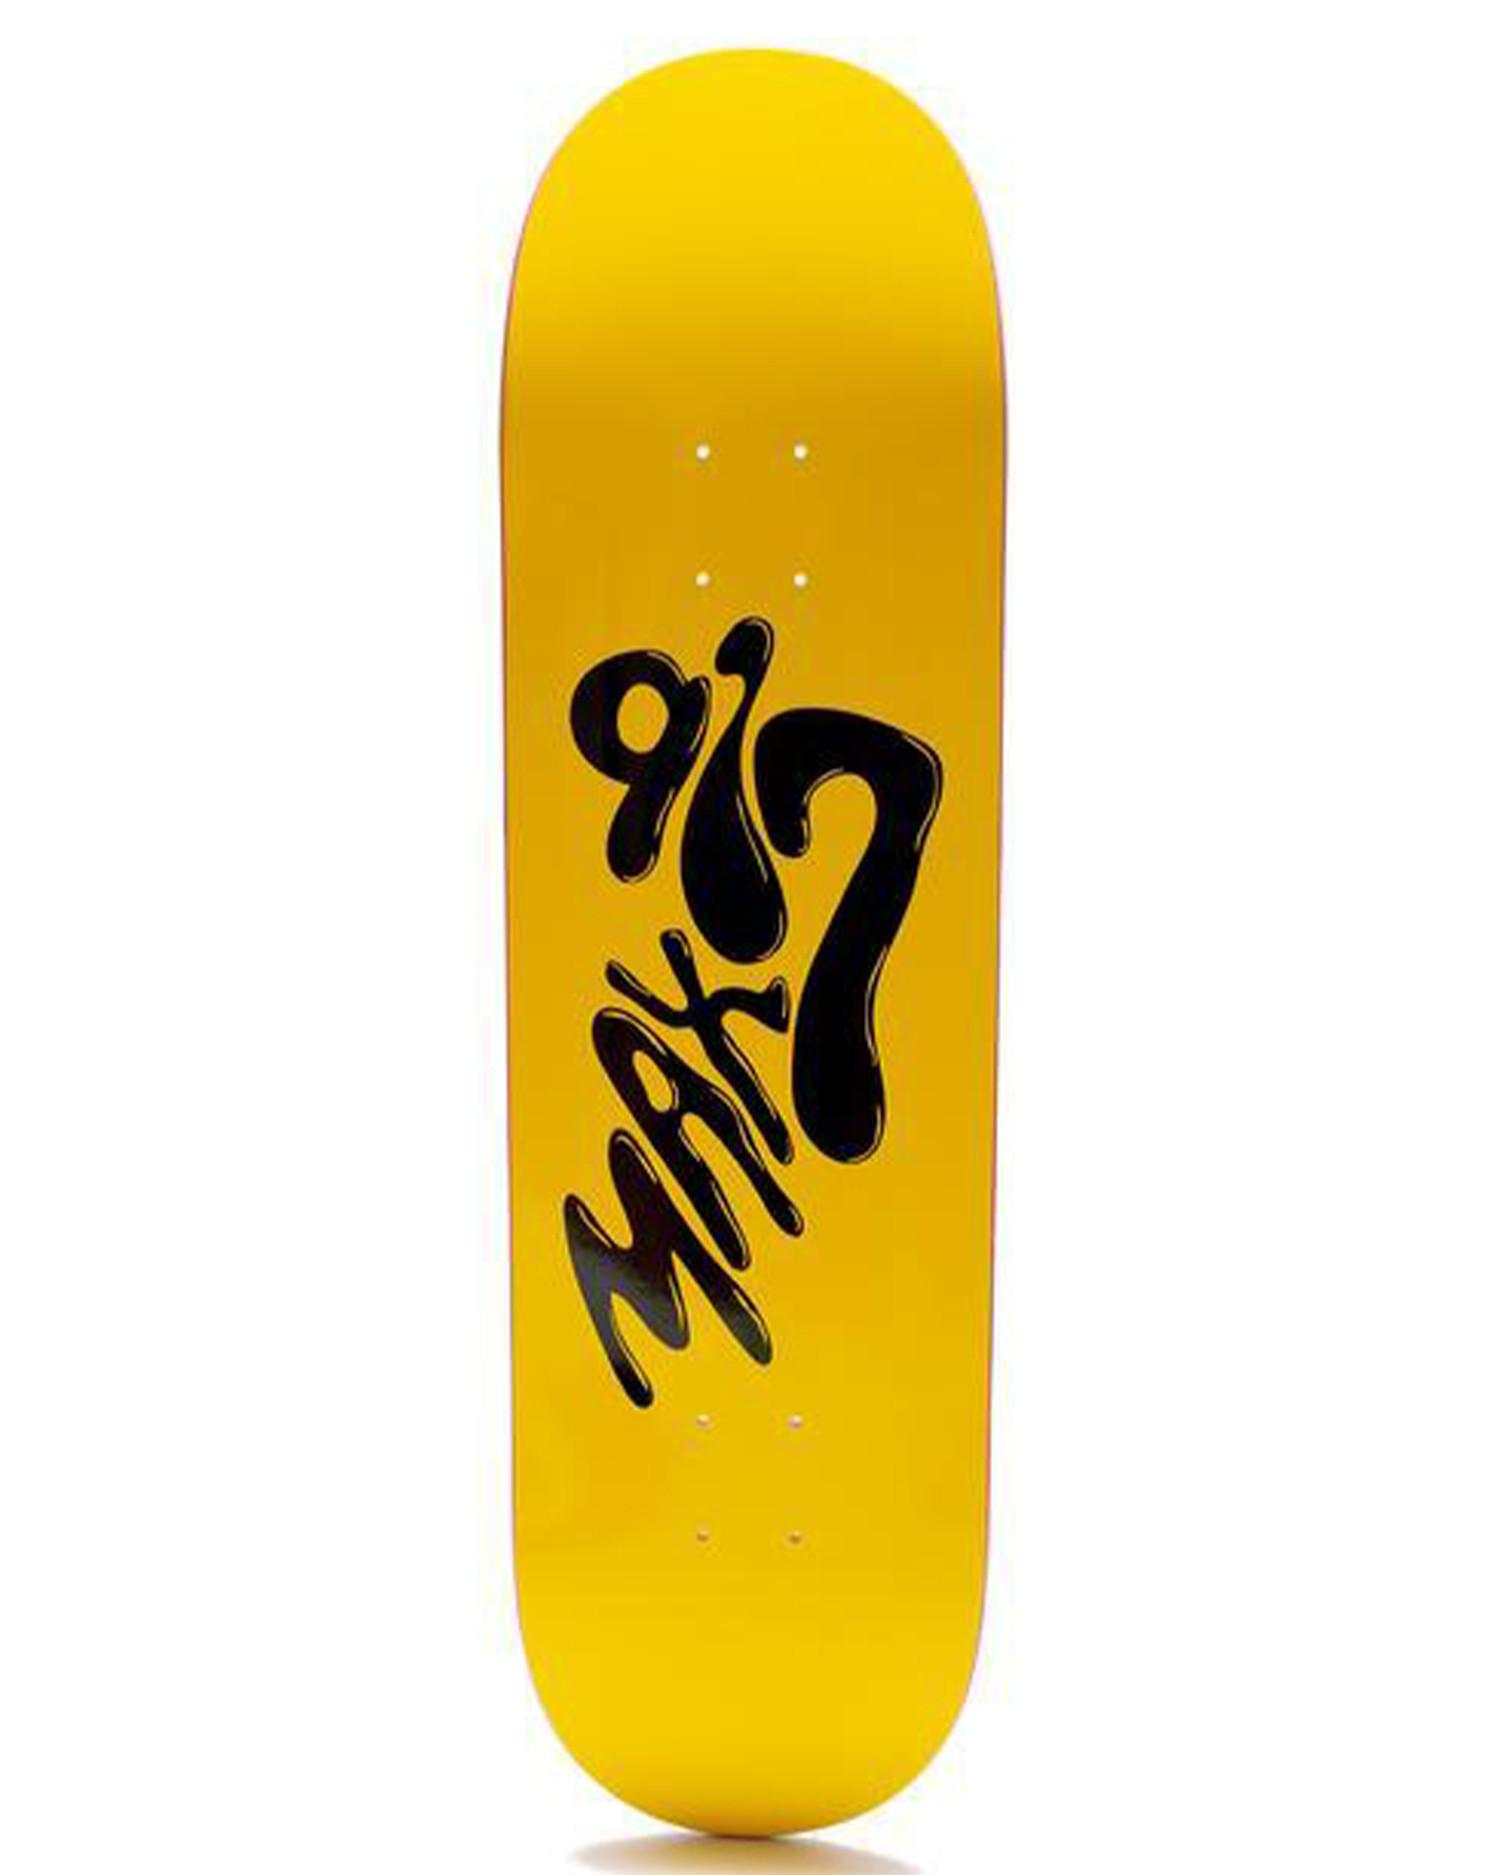 Call Me 917 Max Drippy Deck 8.5 Black